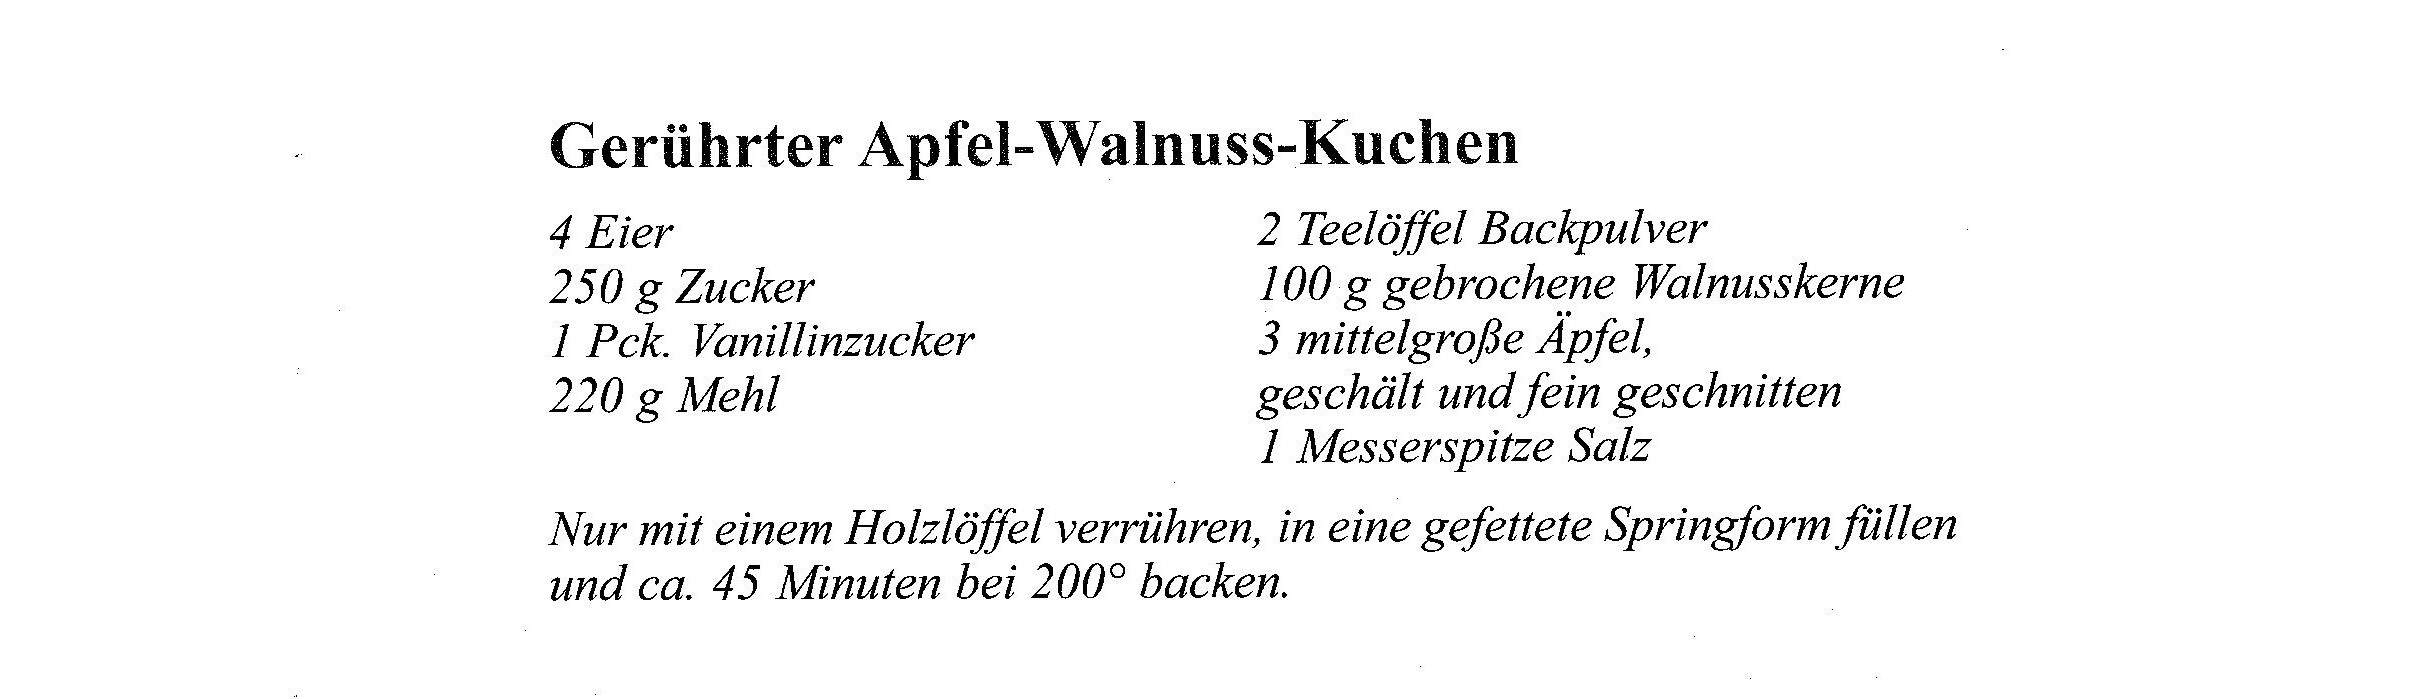 Rezept Dezember Gerührter Apfel-Walnuss-Kuchen